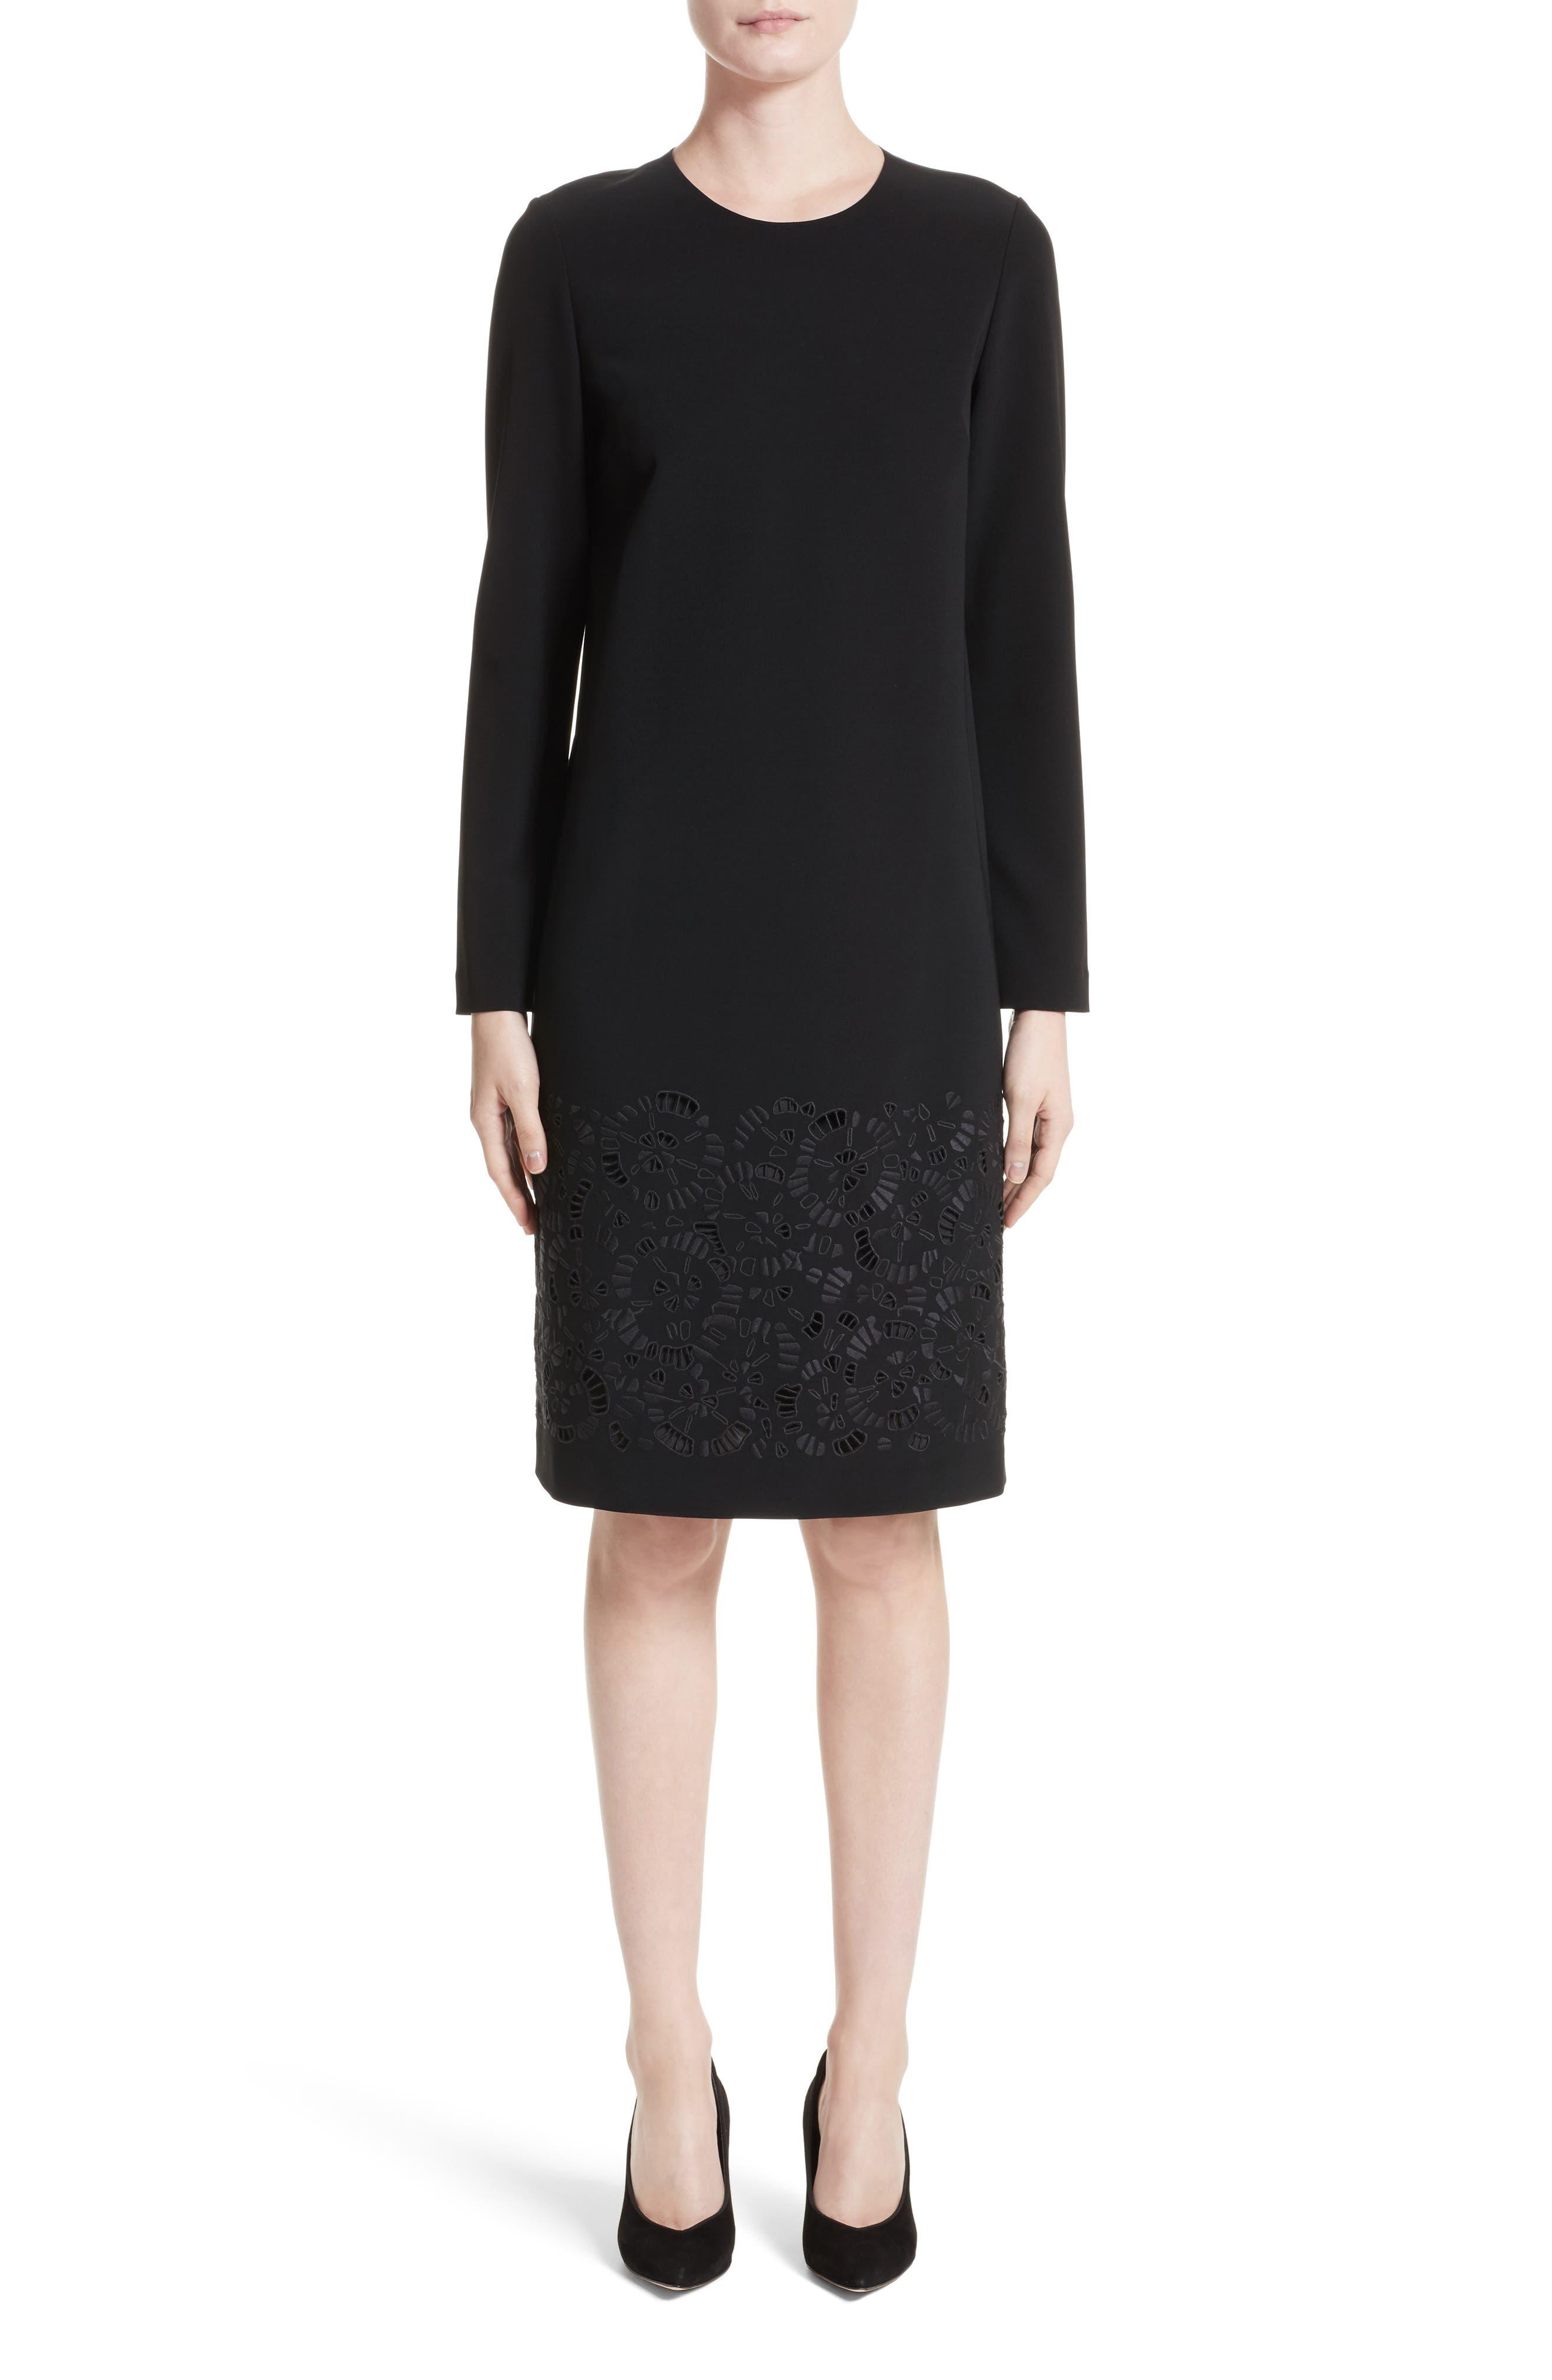 Corbin Embroidered Laser Cut Dress,                         Main,                         color, Black